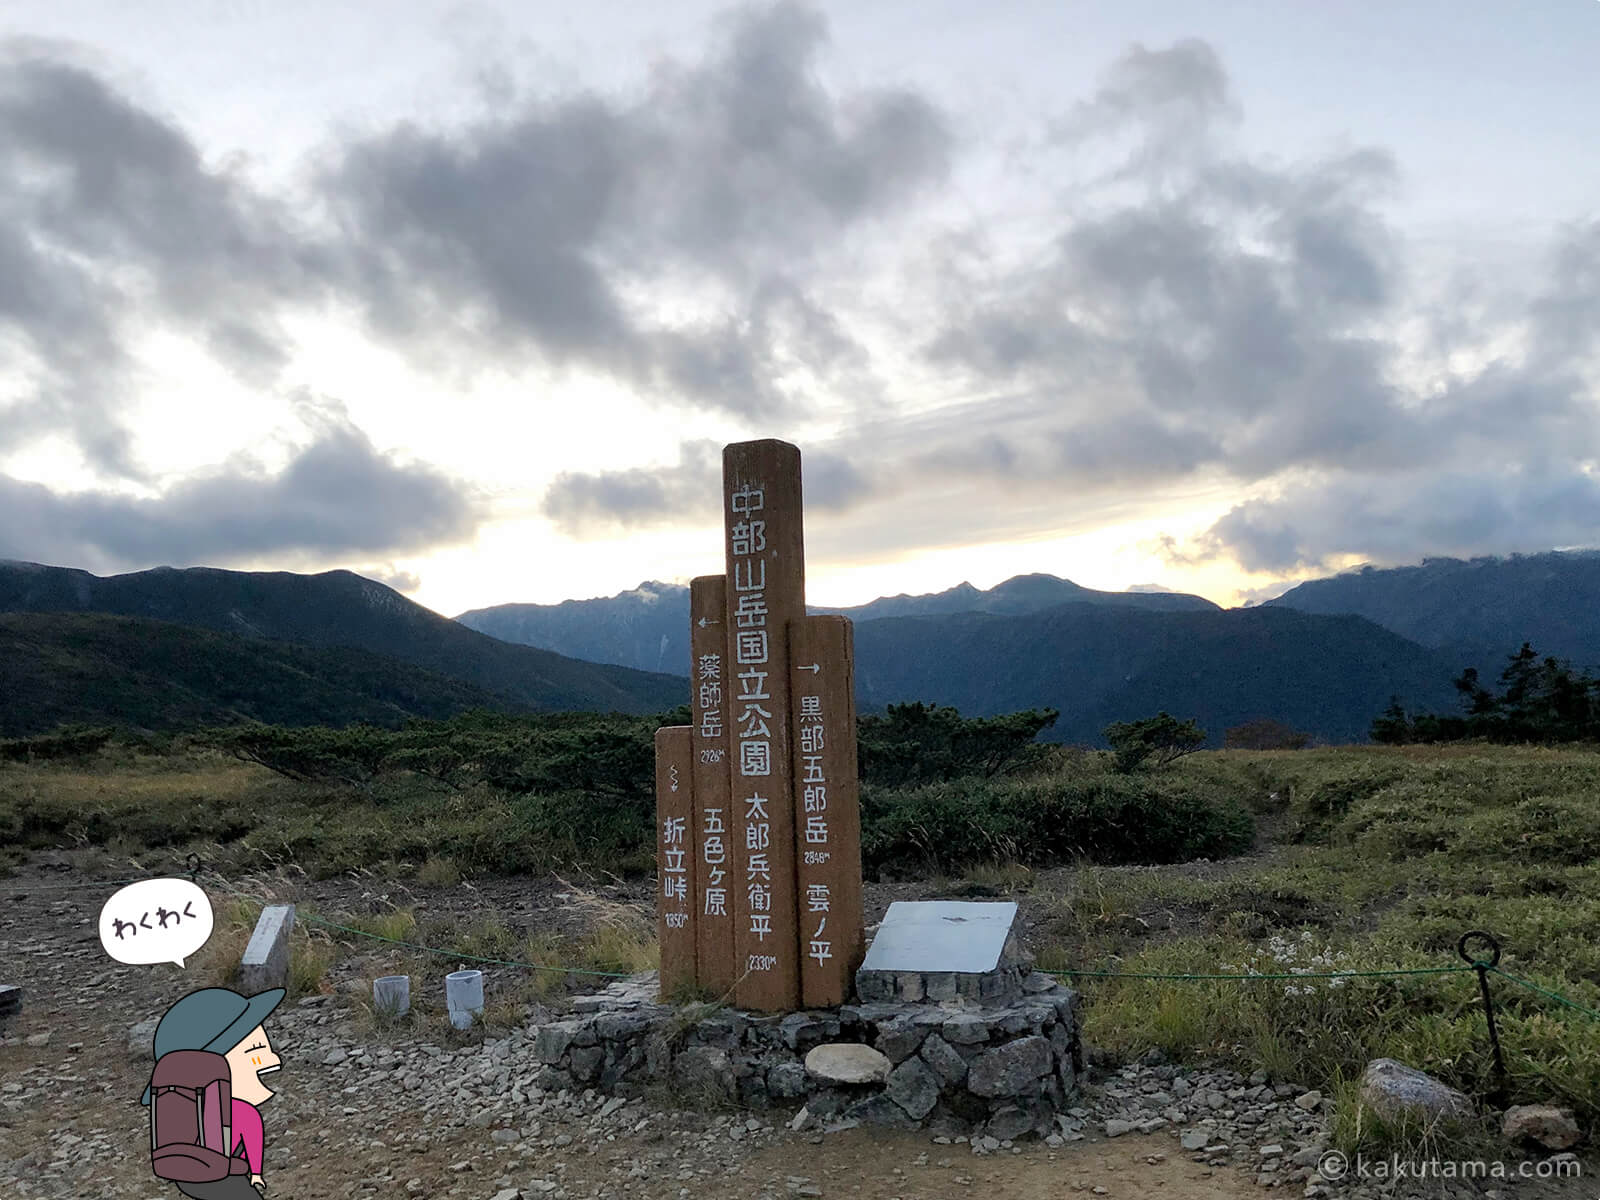 太郎平小屋の道標